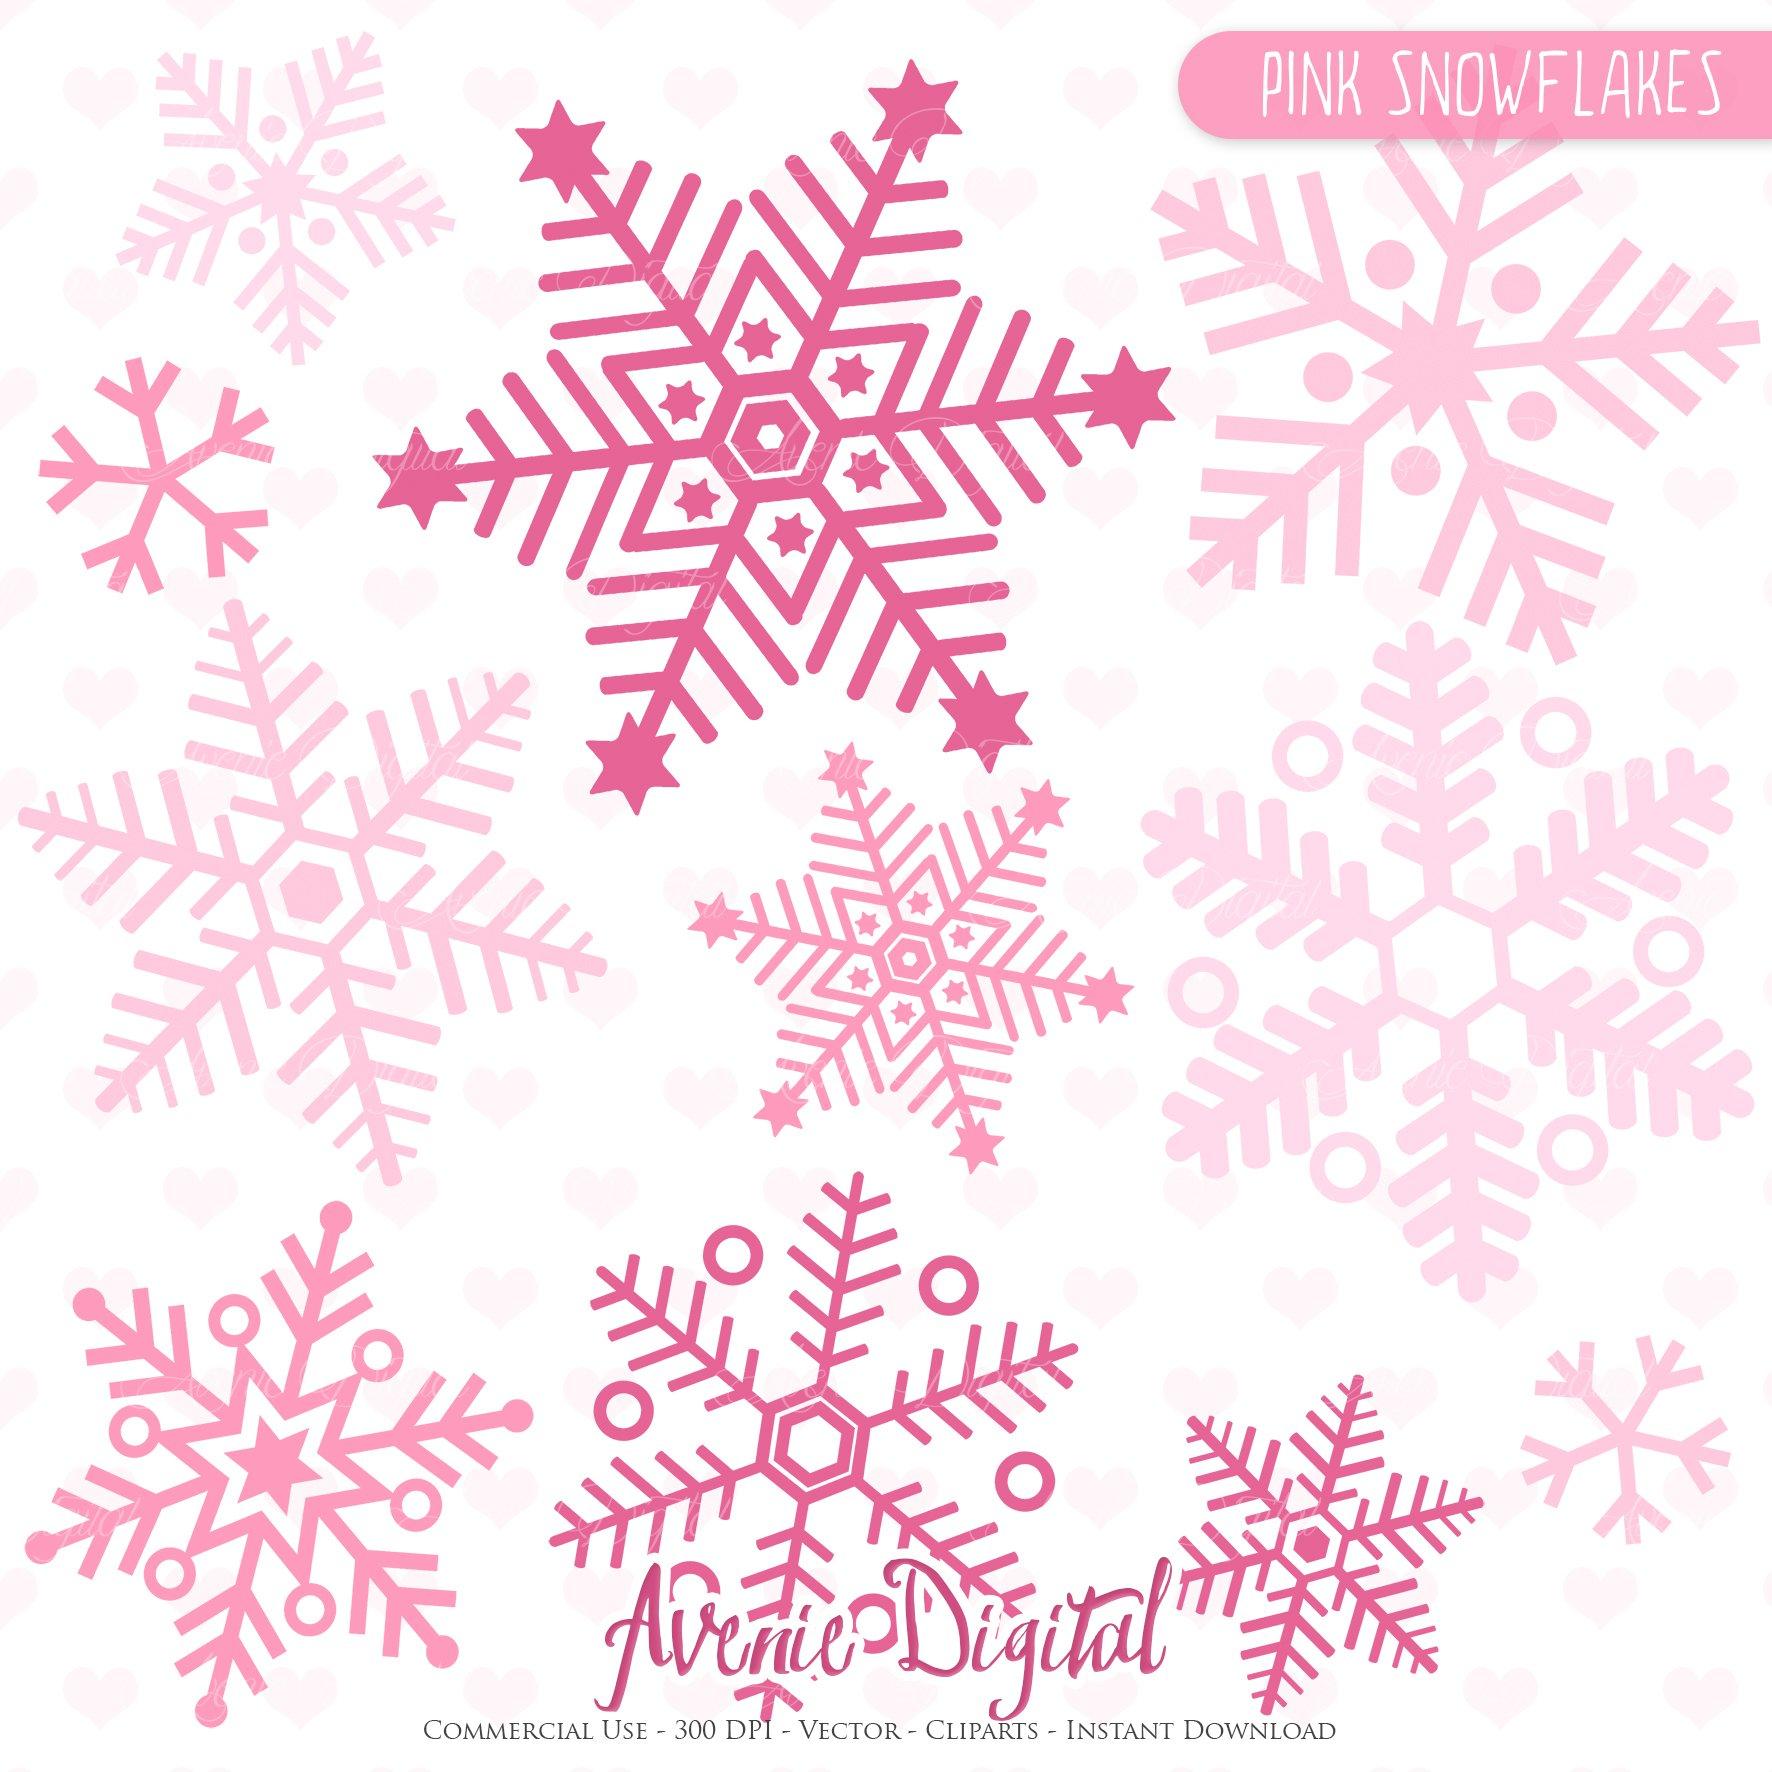 pink snowflakes clip art and vectors illustrations